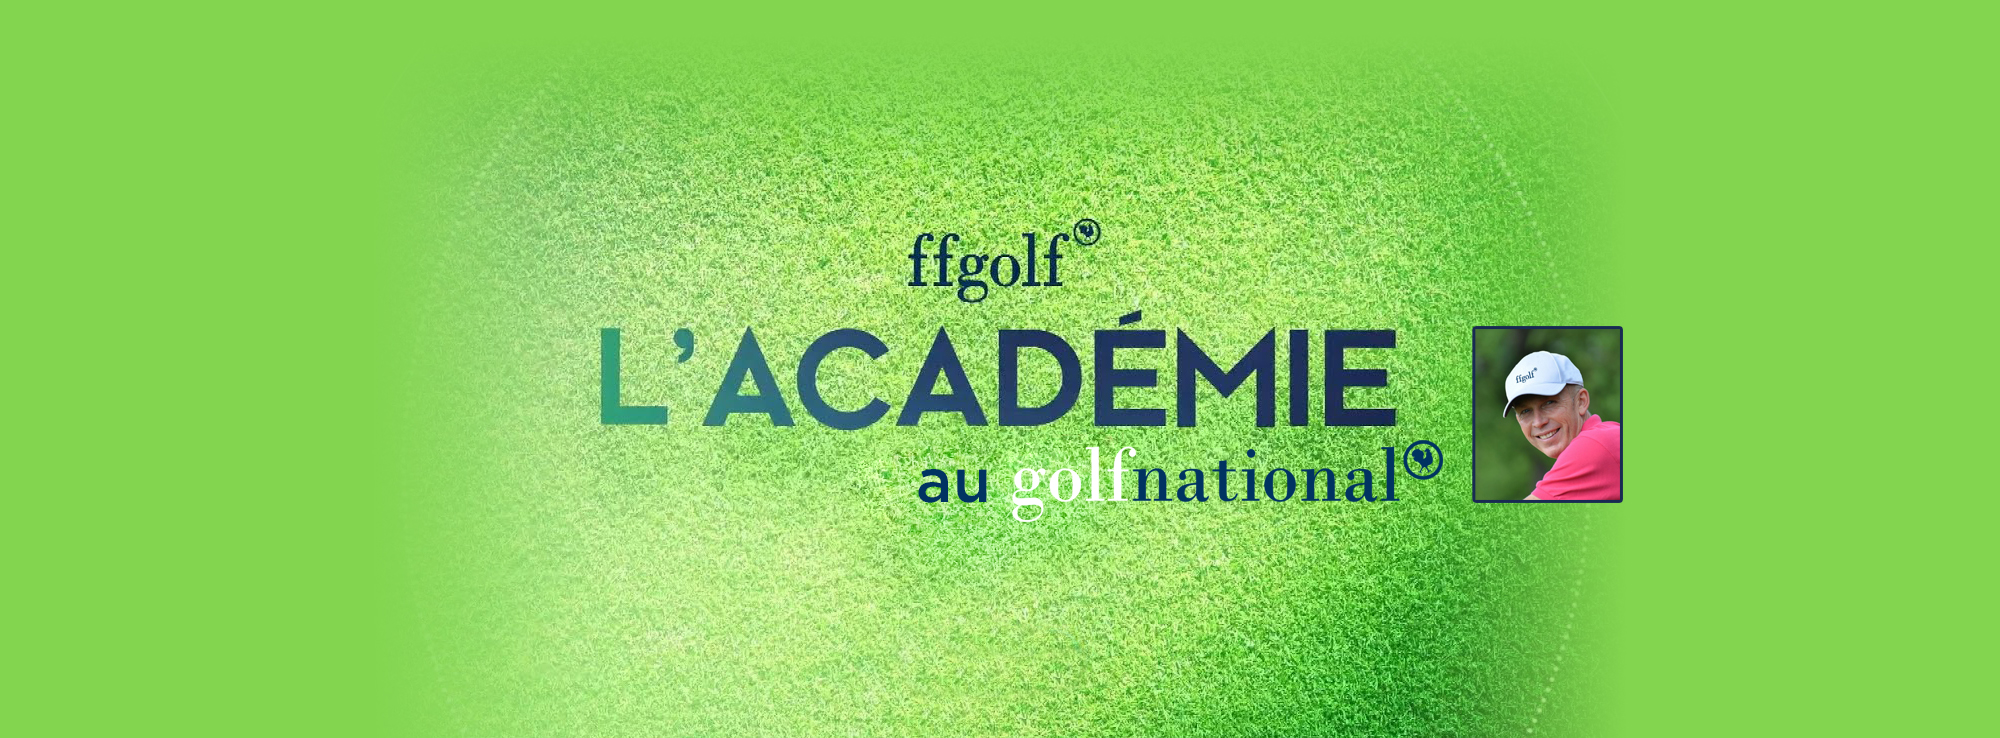 Académie ffgolf